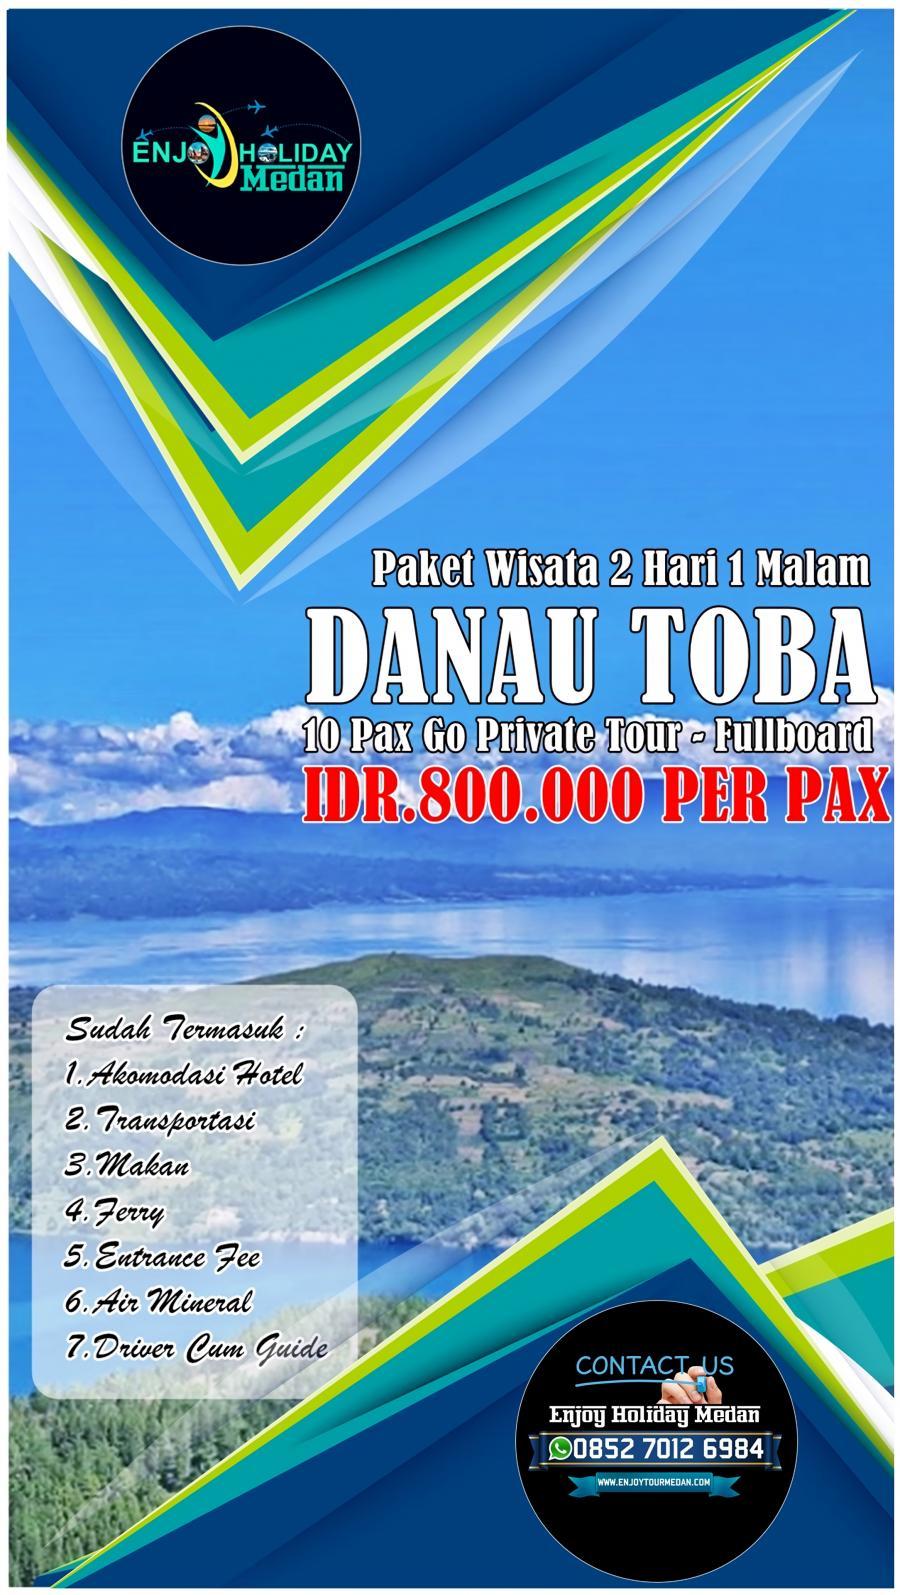 Paket Kunjungan Kerja Danau Toba